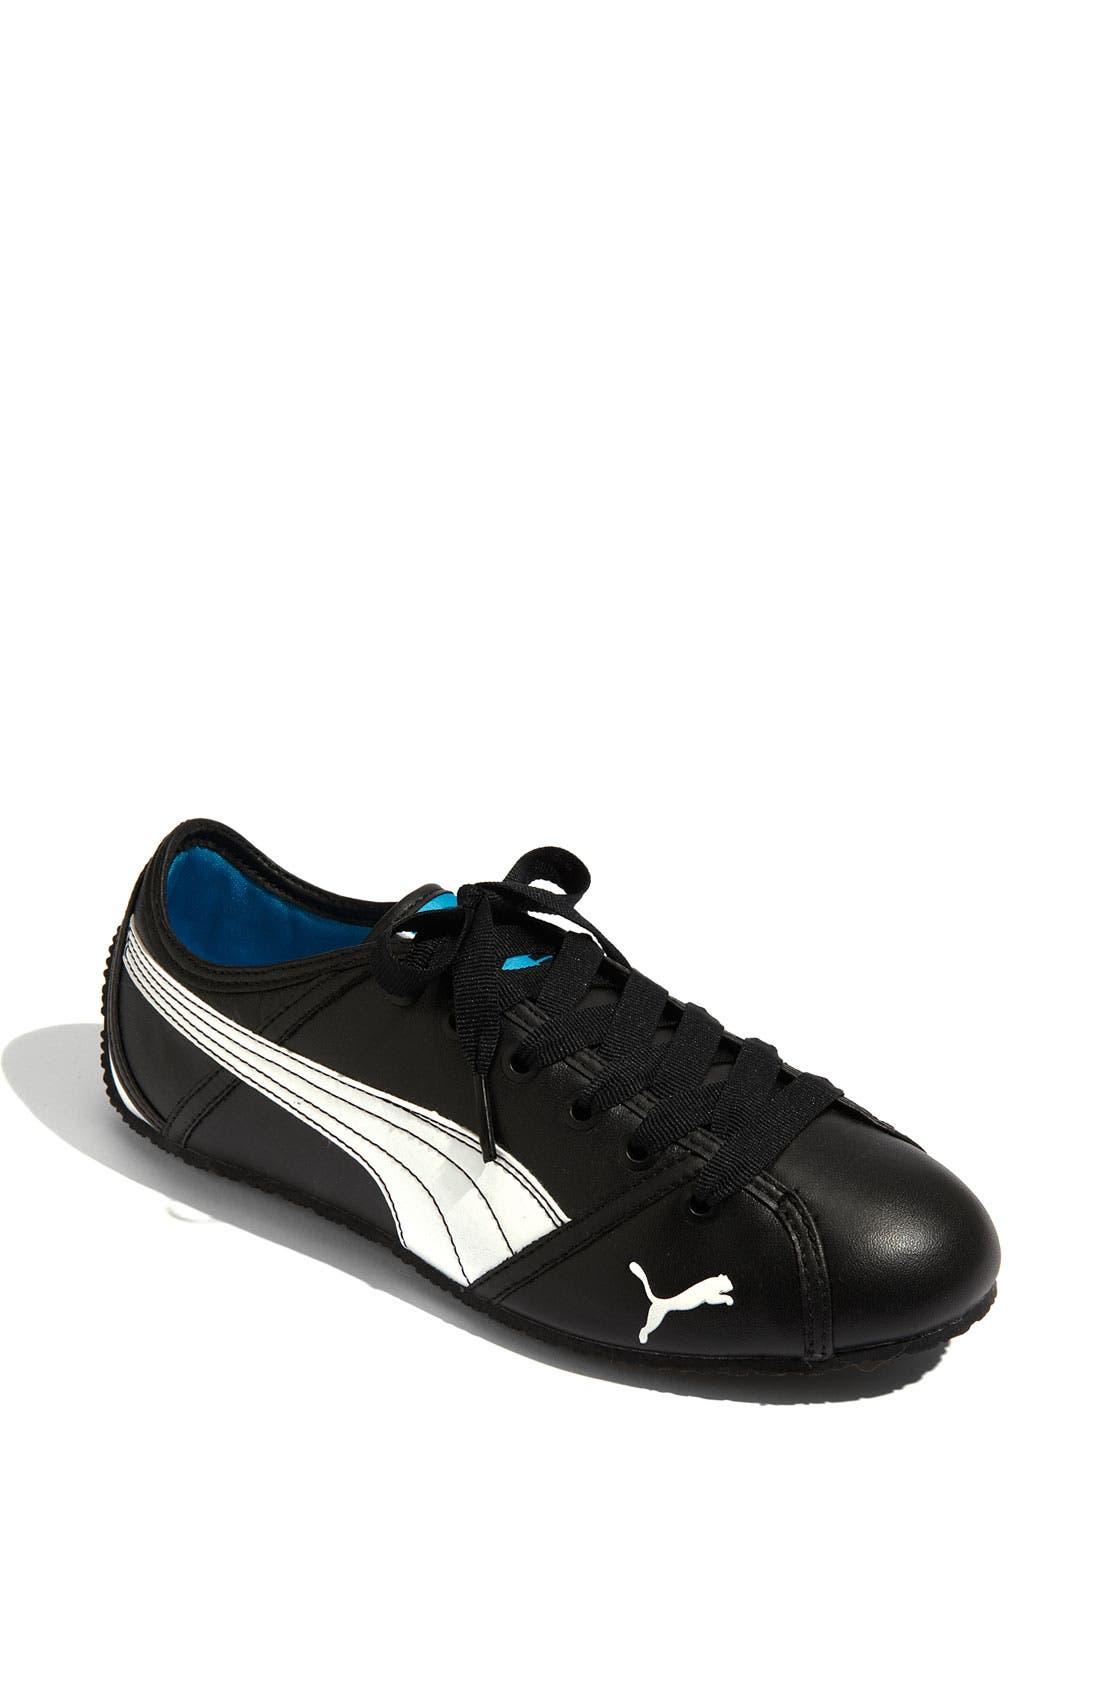 Alternate Image 1 Selected - PUMA 'Style Cat' Racing Sneaker (Women)